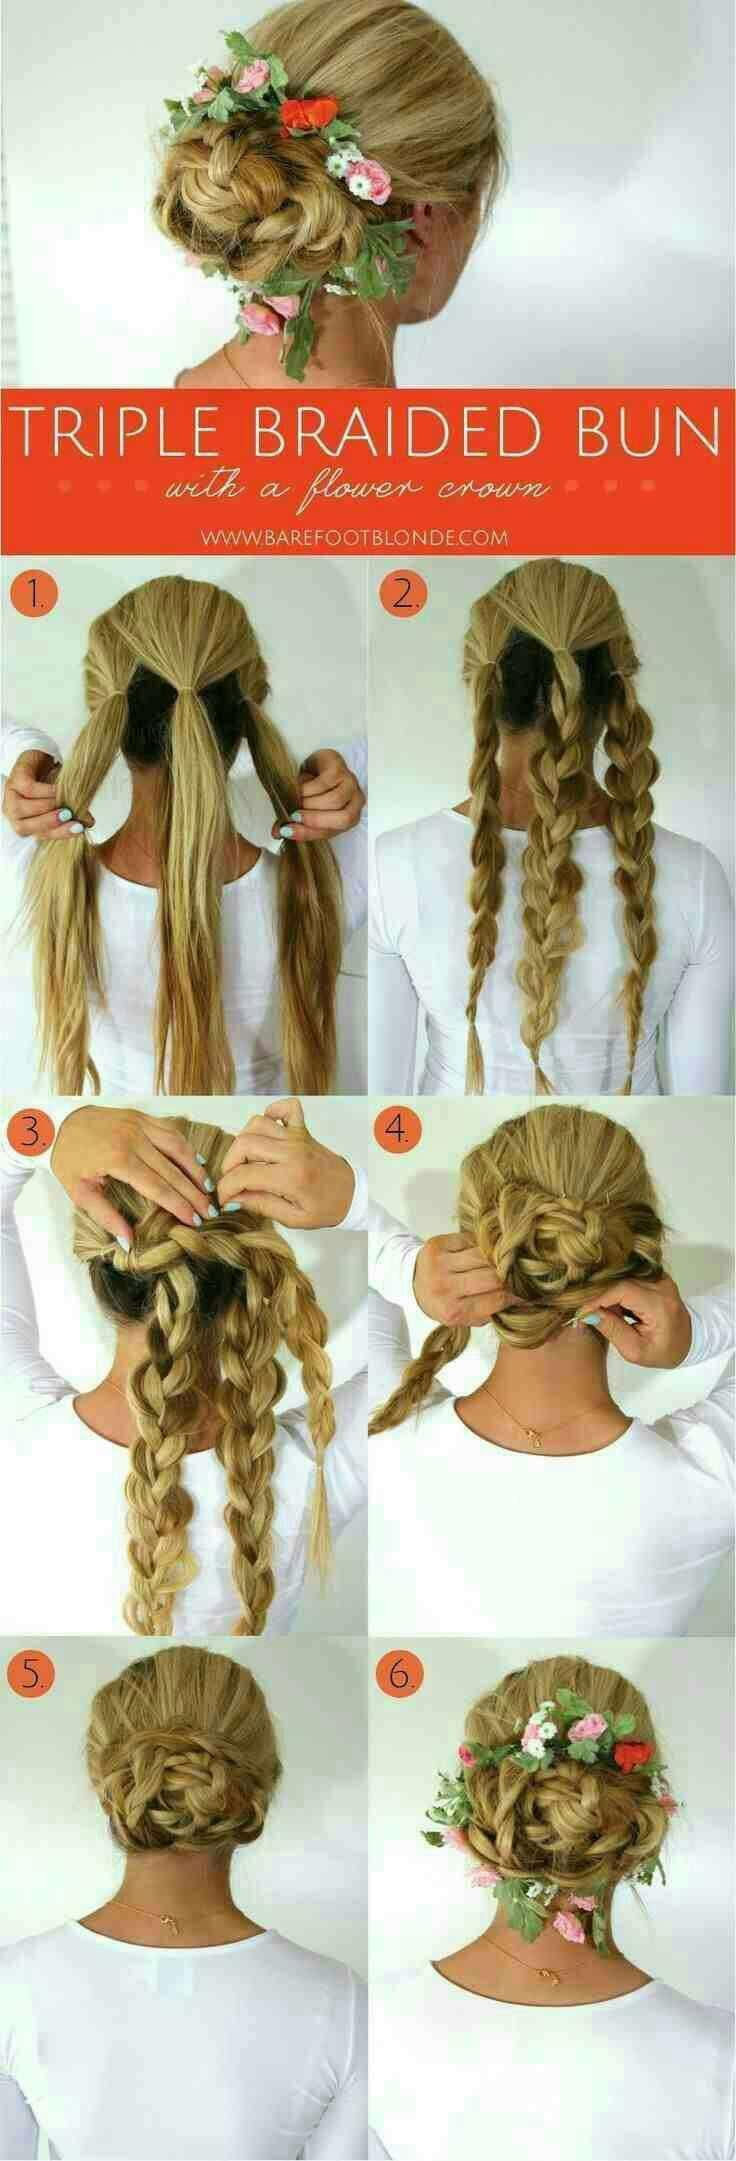 Three braided bun #Beauty #Trusper #Tip